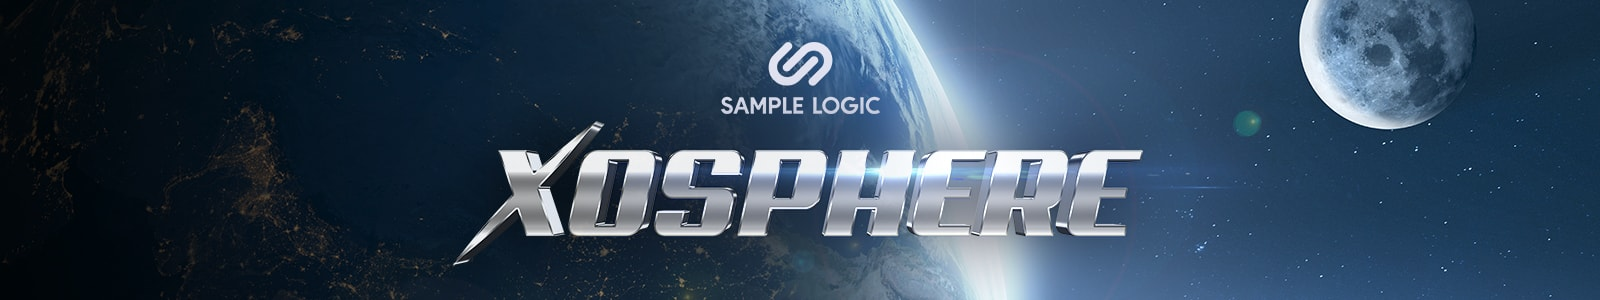 xosphere by sample logic